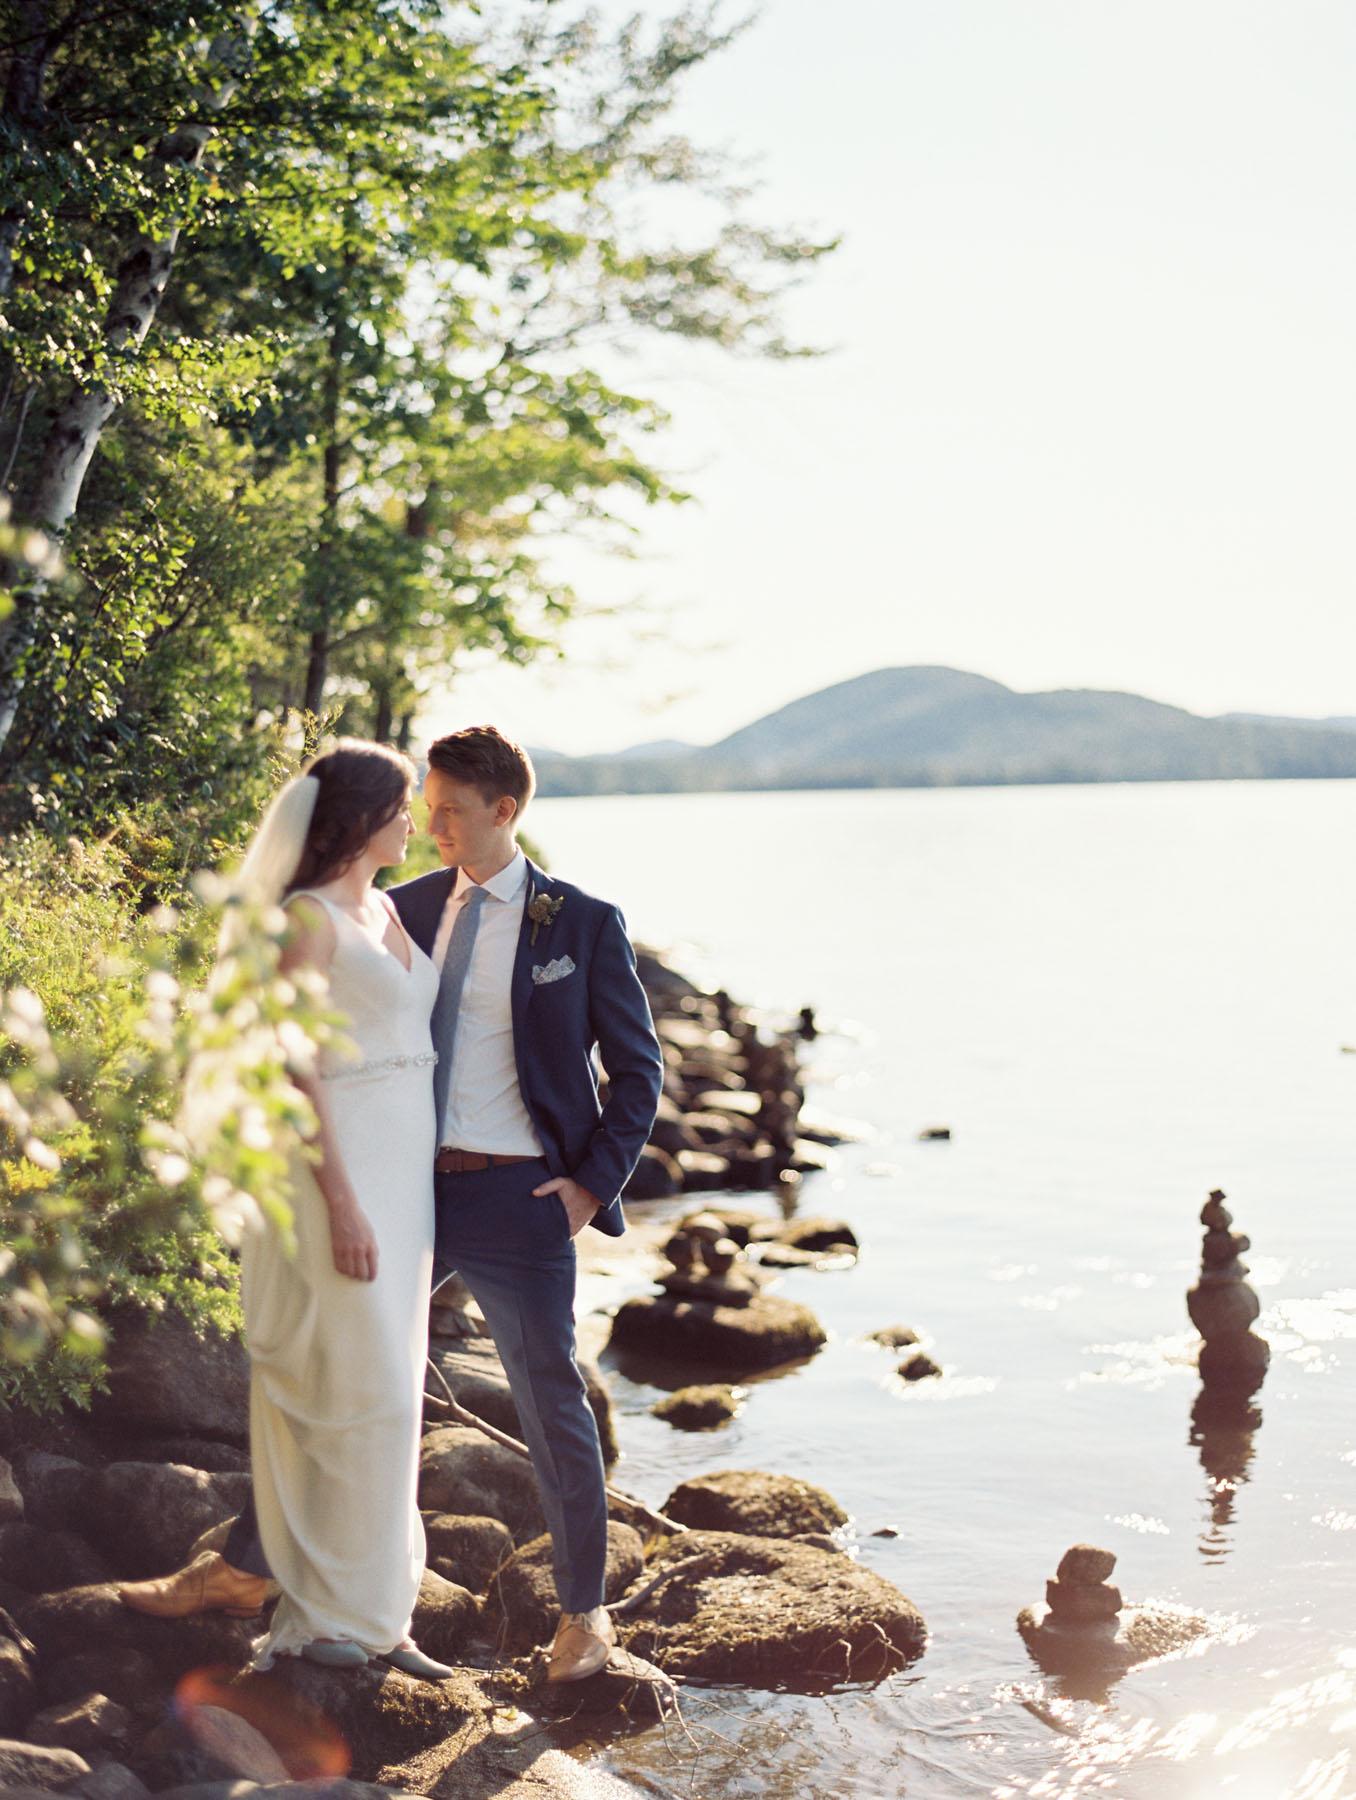 Wedding-Photography-Campground-24.jpg